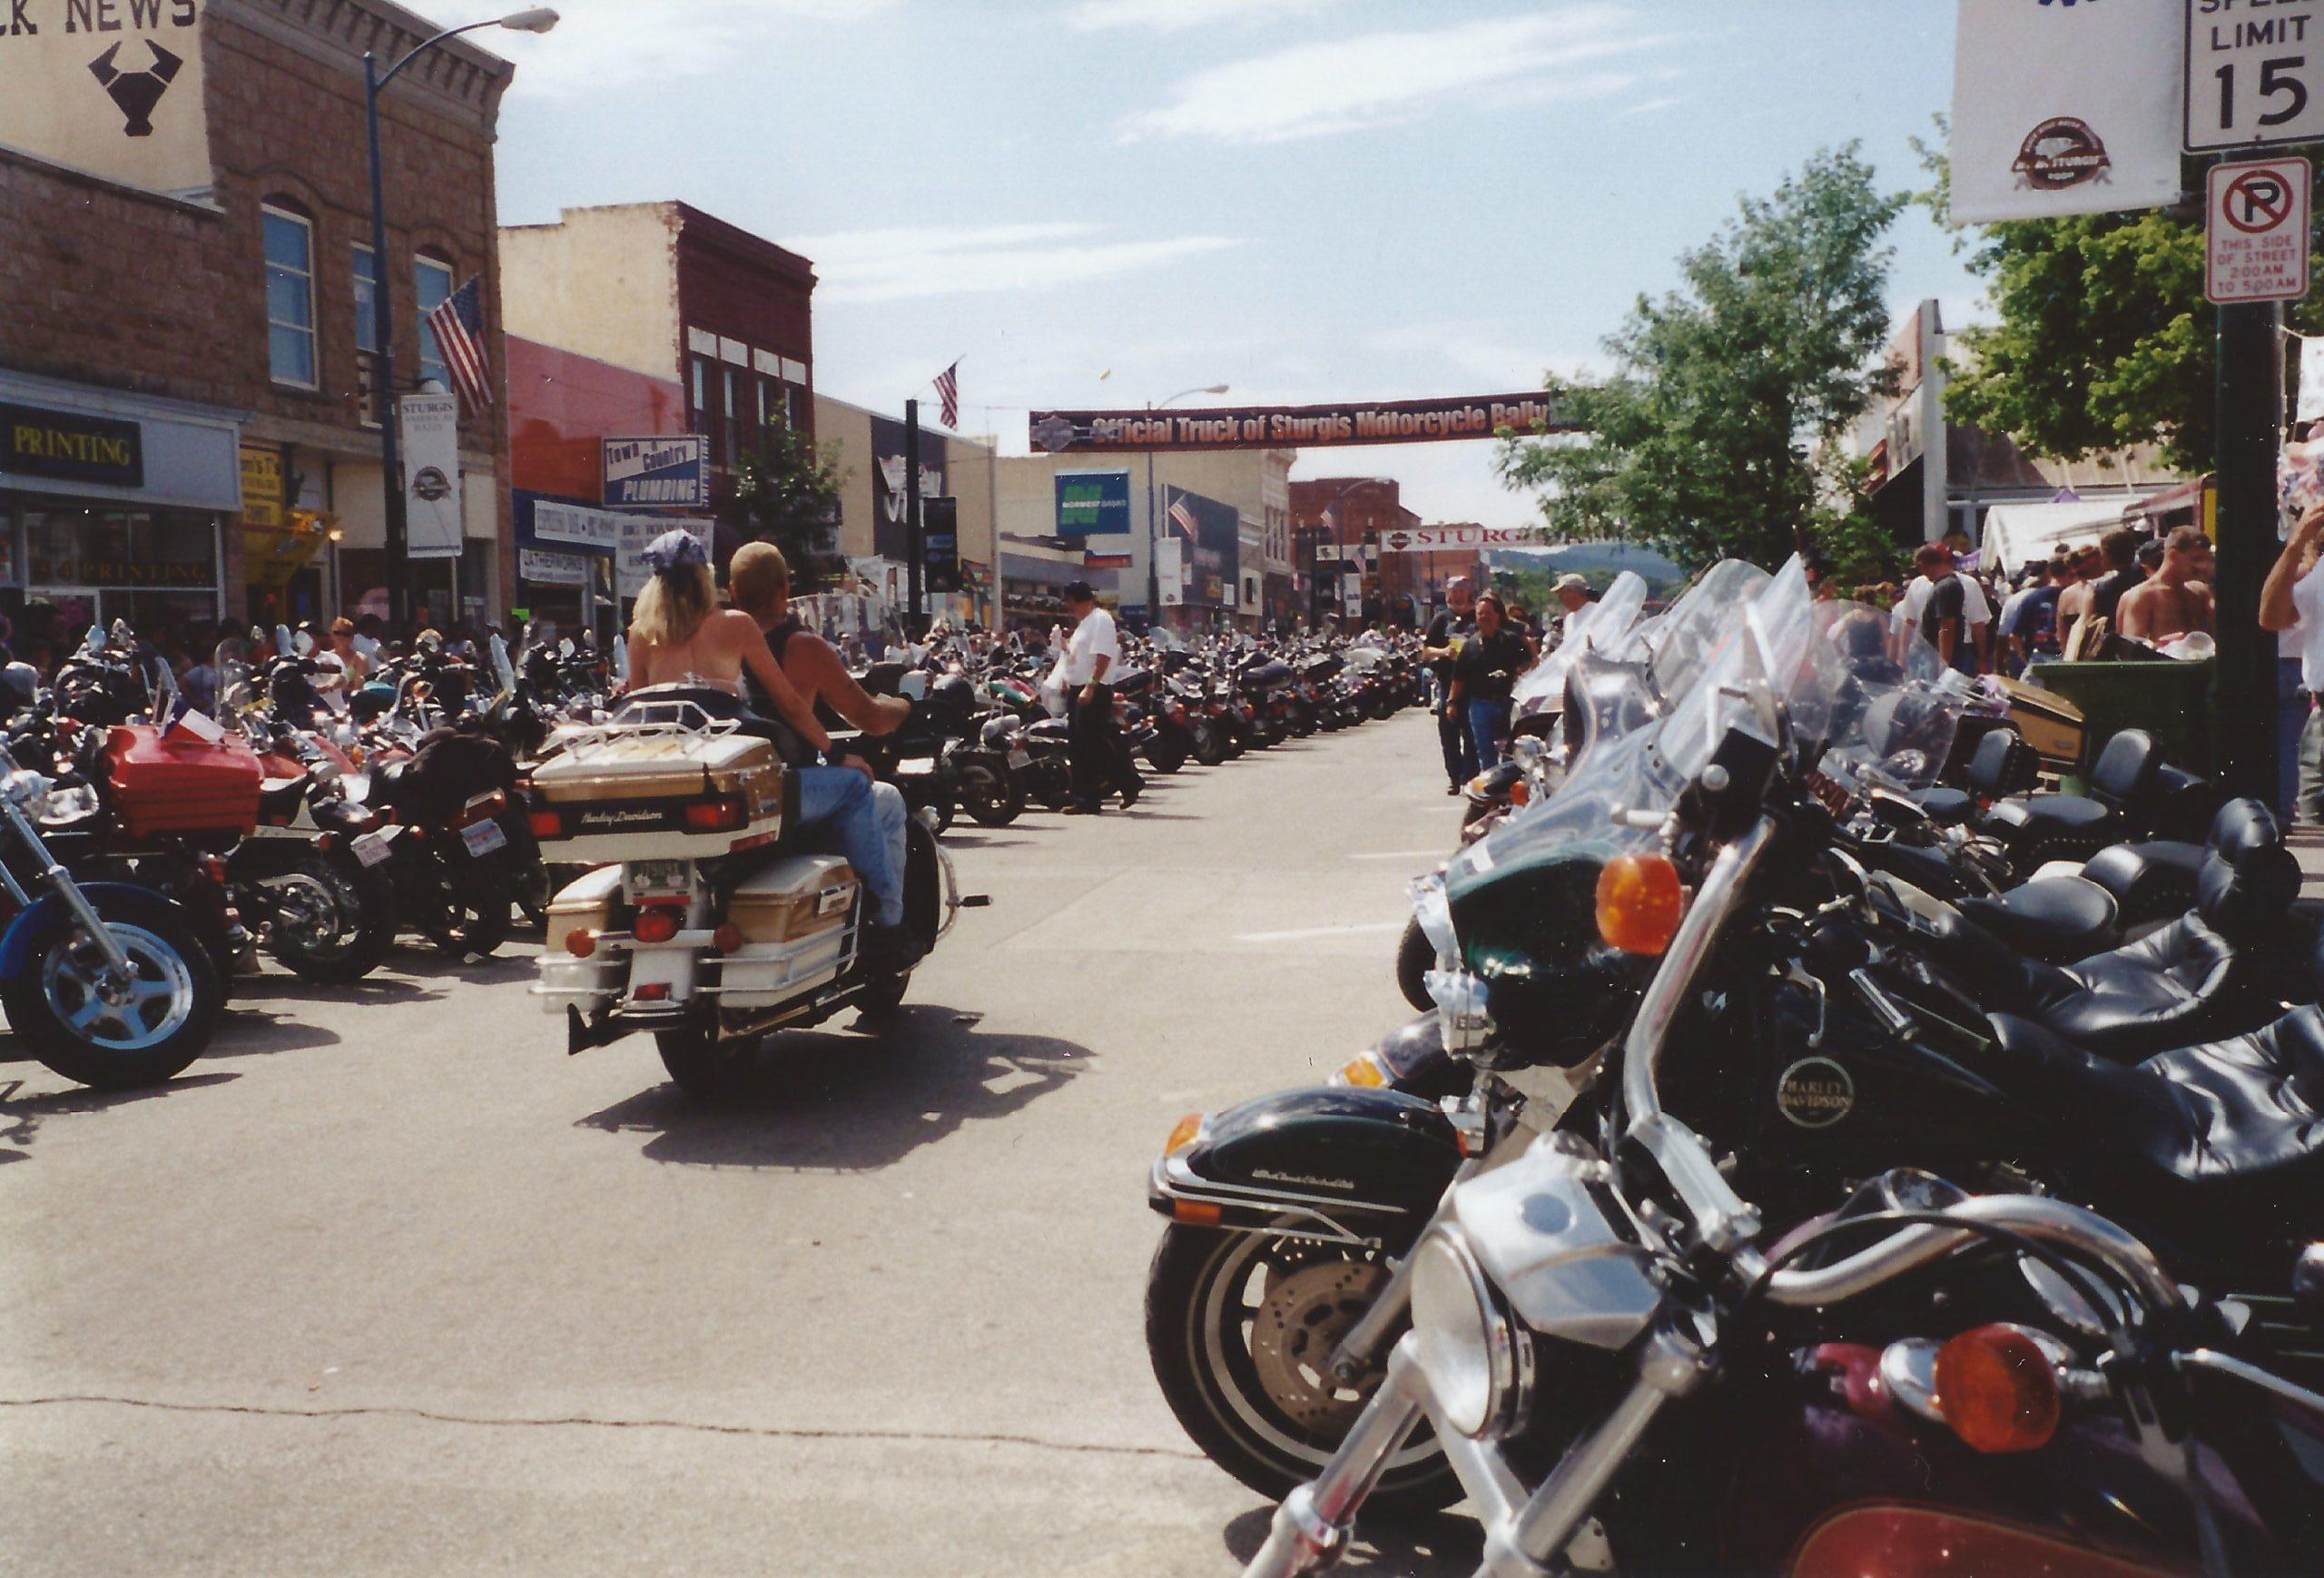 Sturgis motorcycle rally 2000